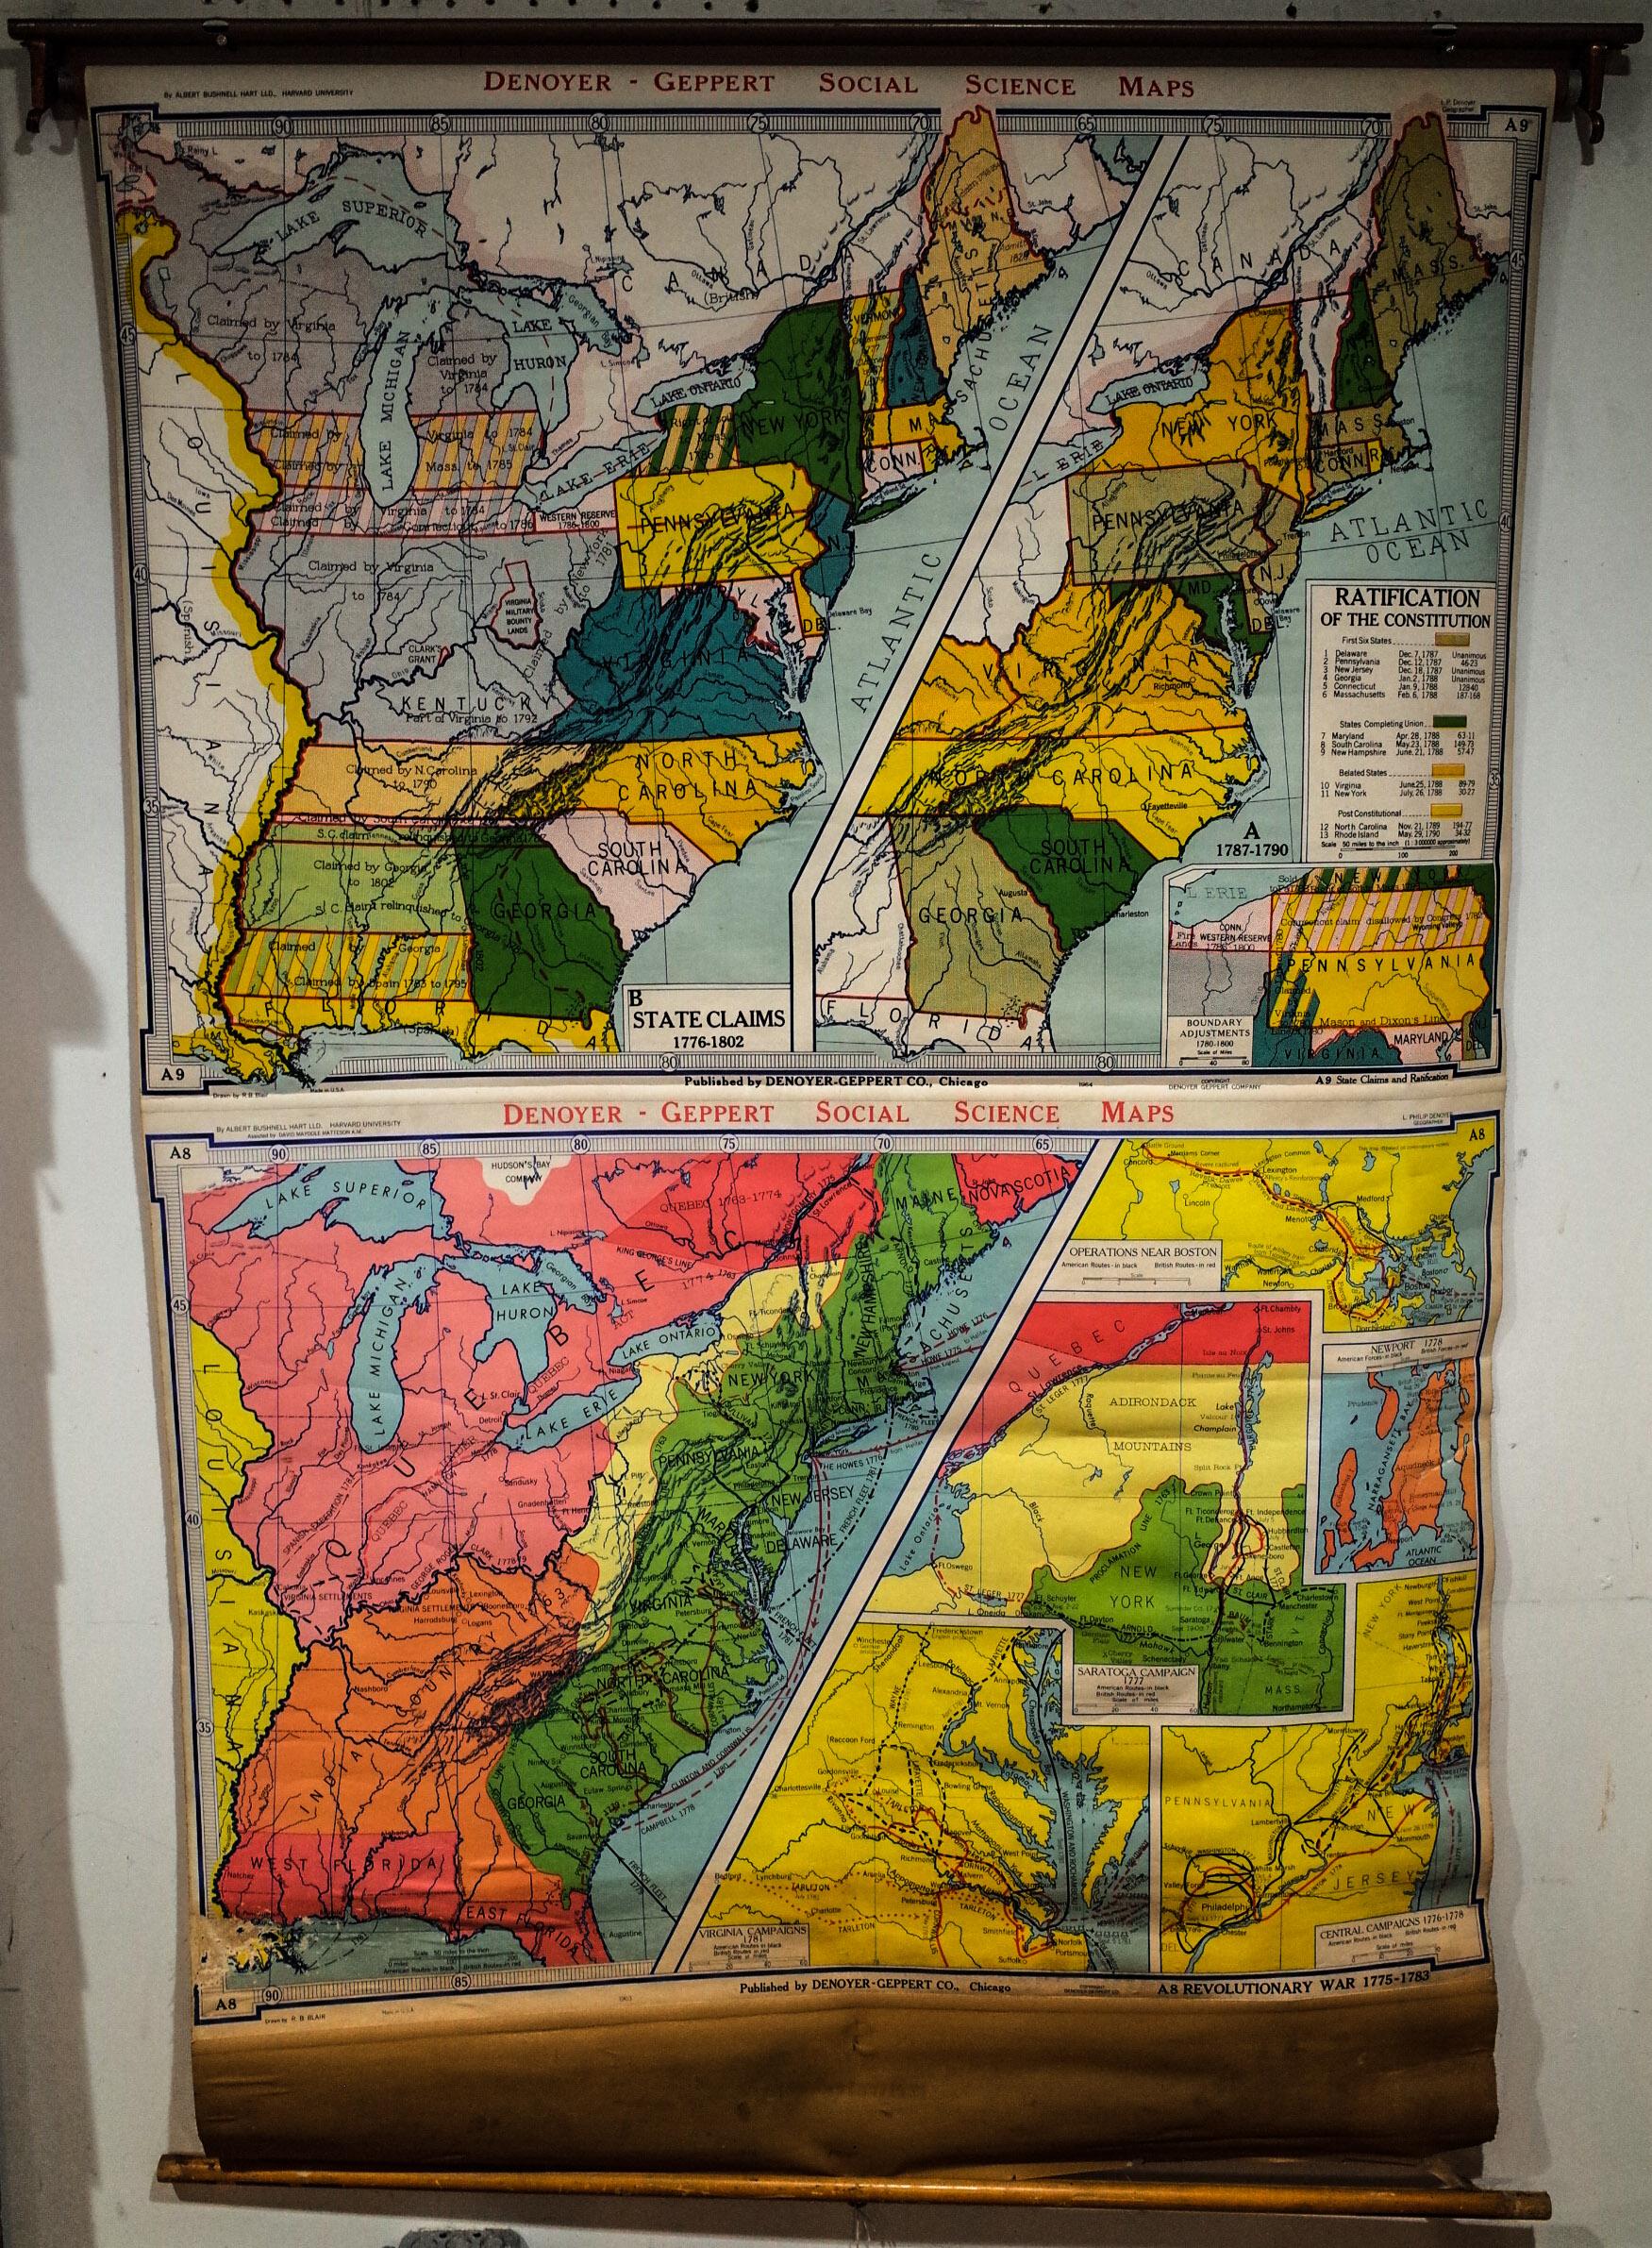 revolutionary-war-map-denoyer-geppert-social-science-maps.jpg